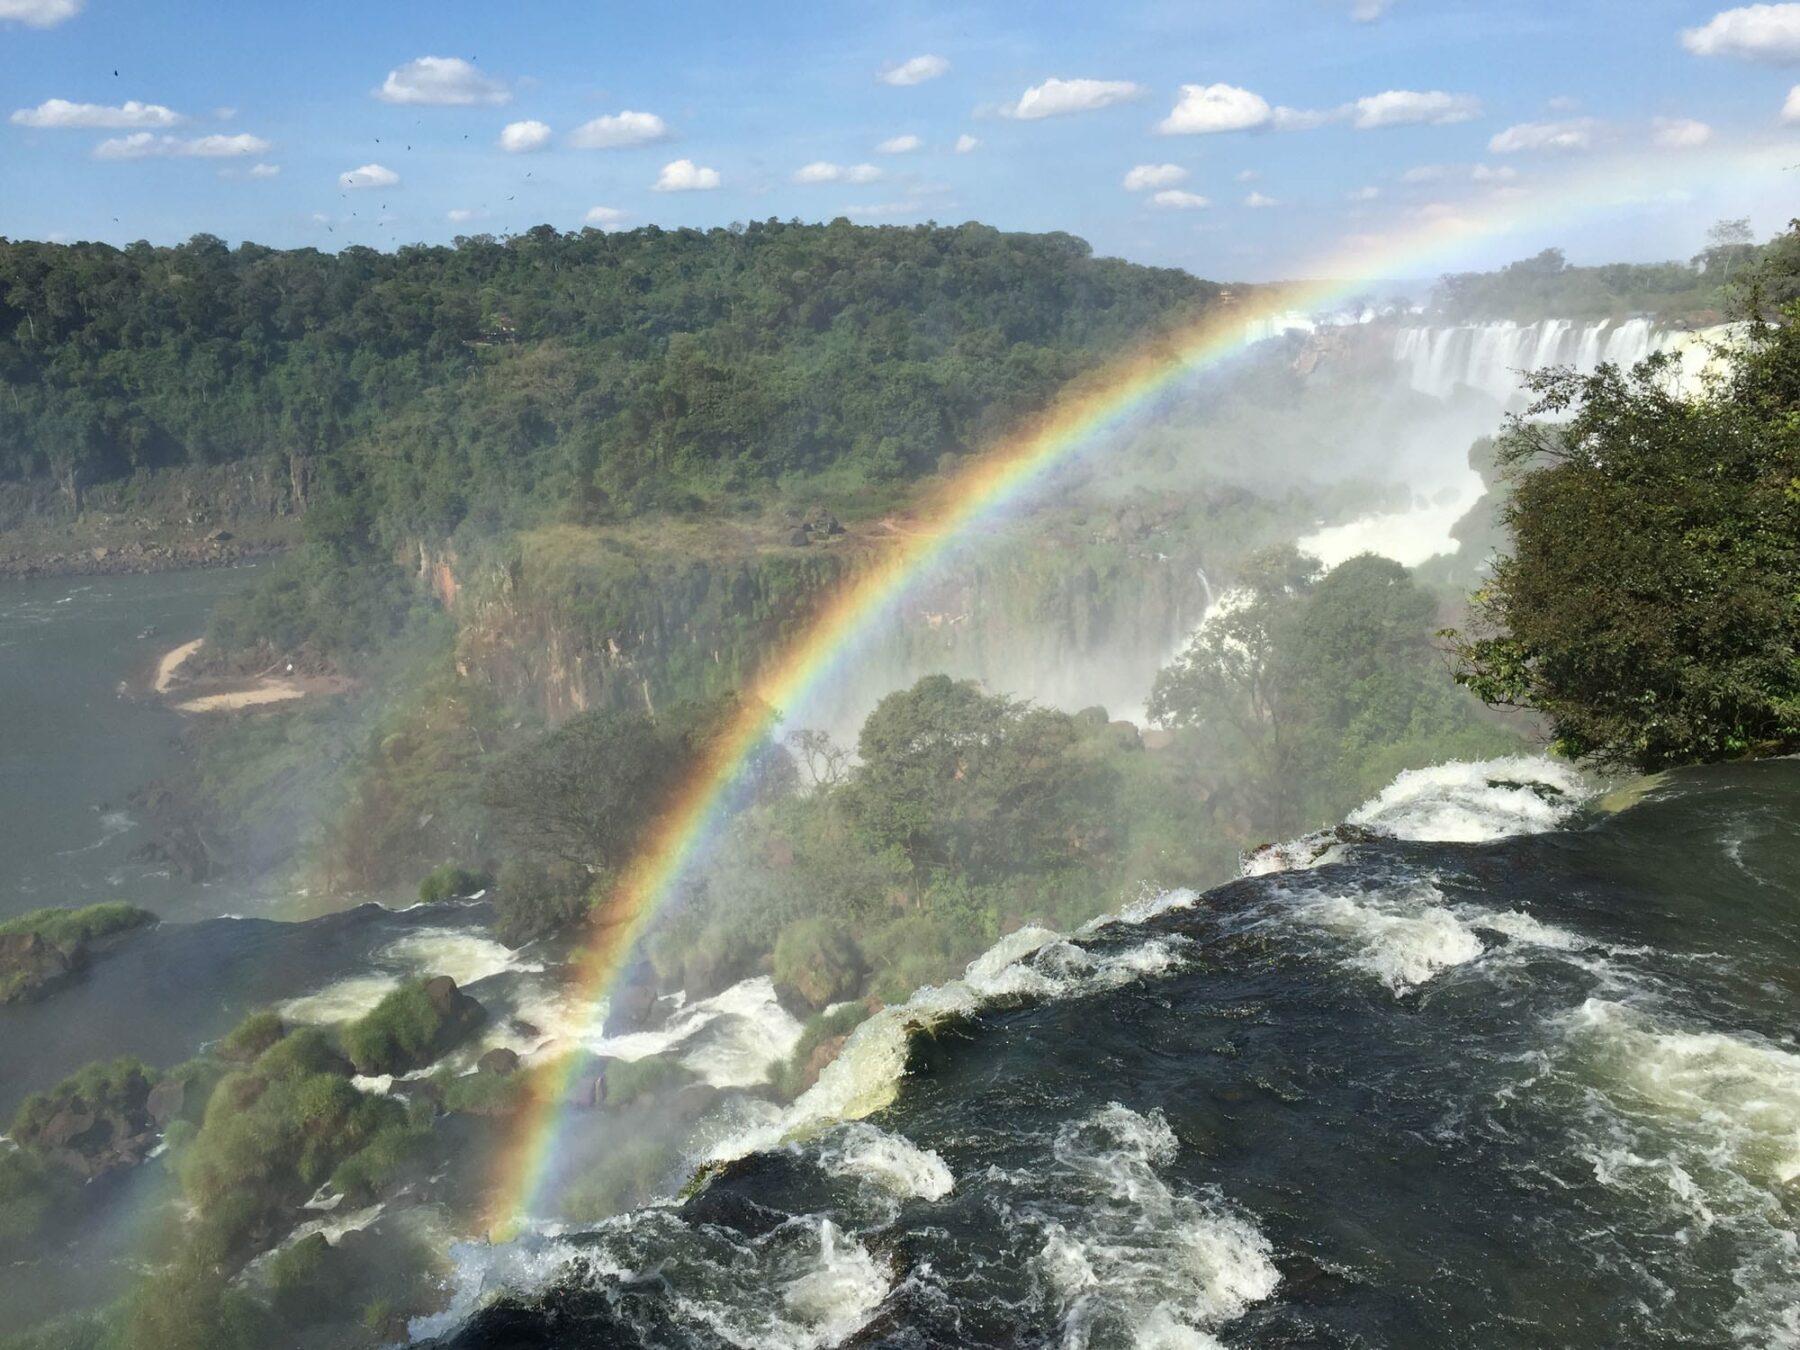 argentina igazu falls rainbow